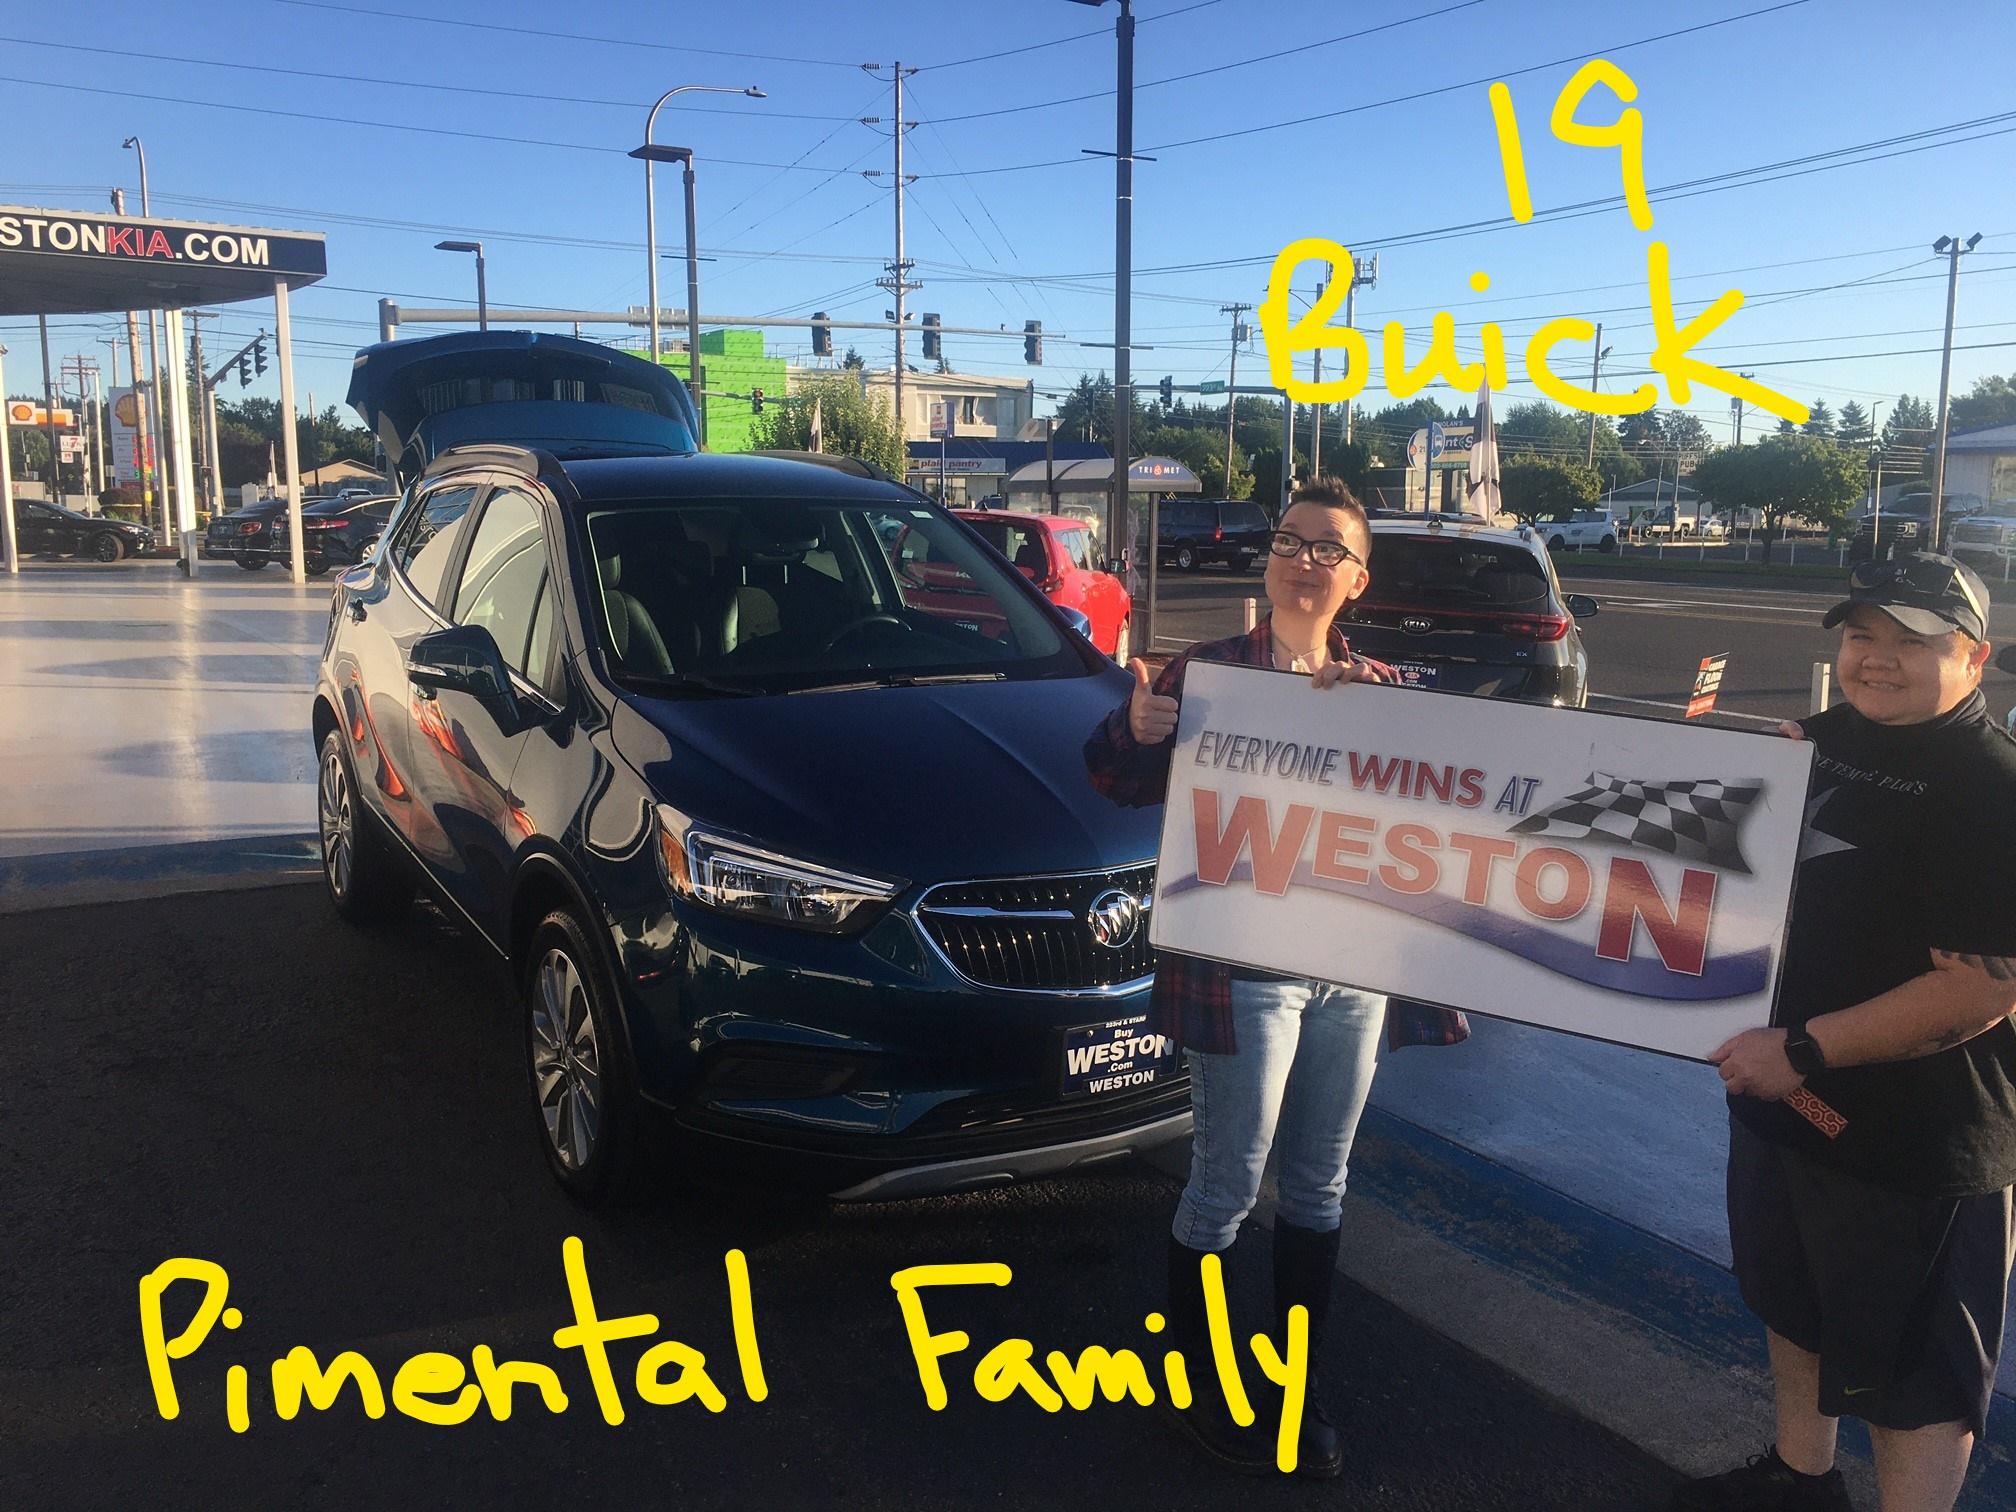 19 Buick Pimental Family